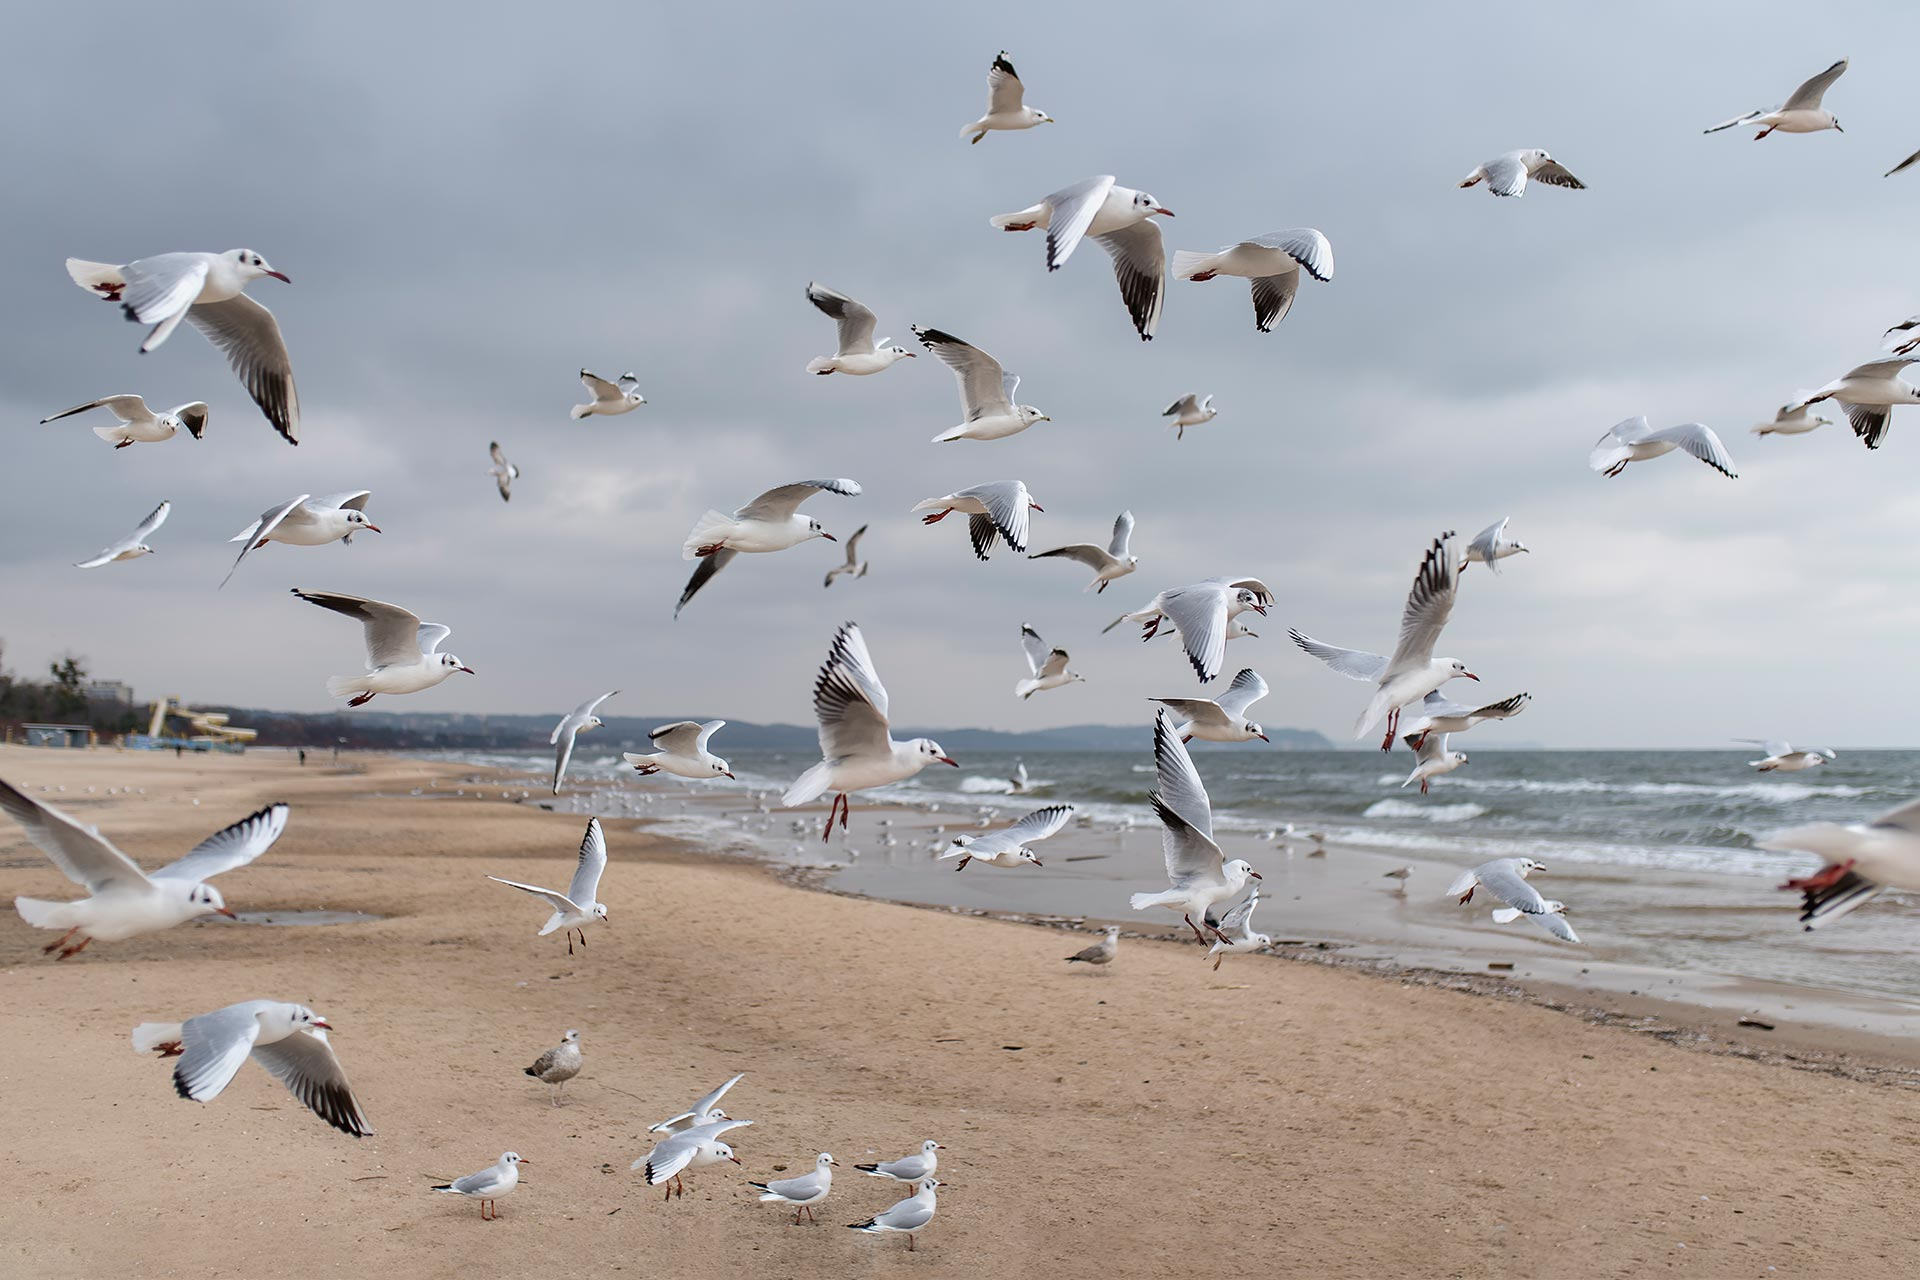 Maritime Landschaften Möwe Ostsee Wandbild Bild auf Leinwand Acrylglas Aludibond